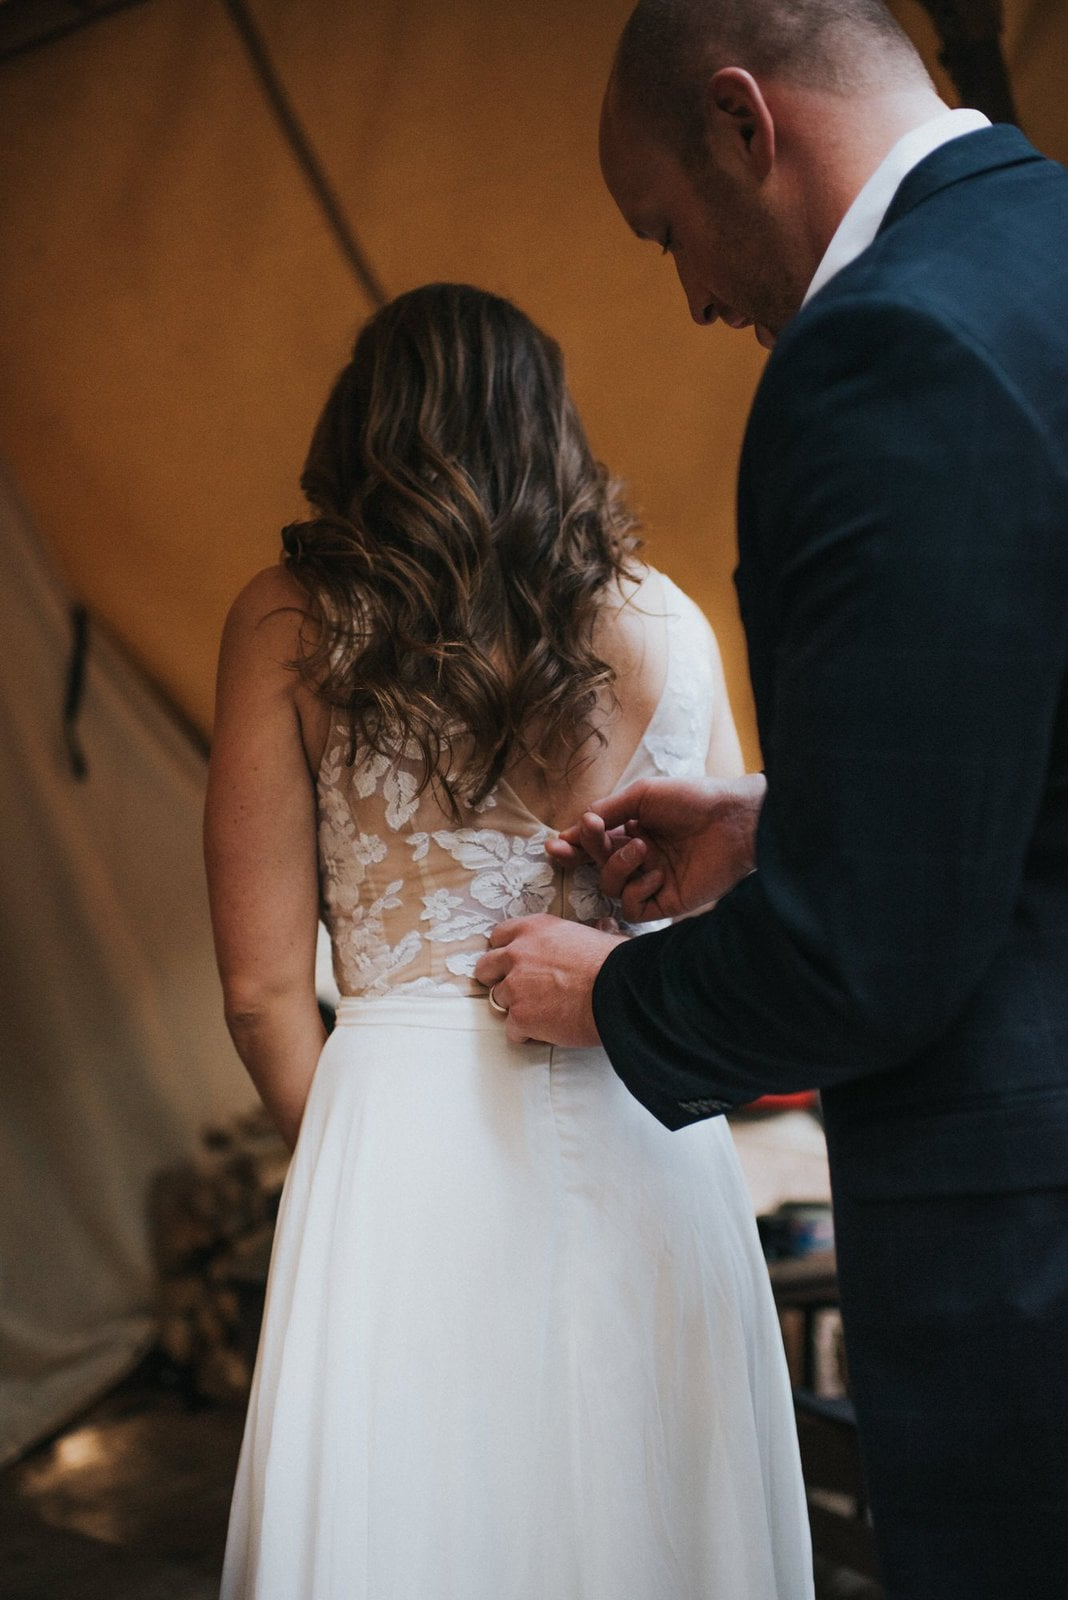 groom zipping wedding dress.